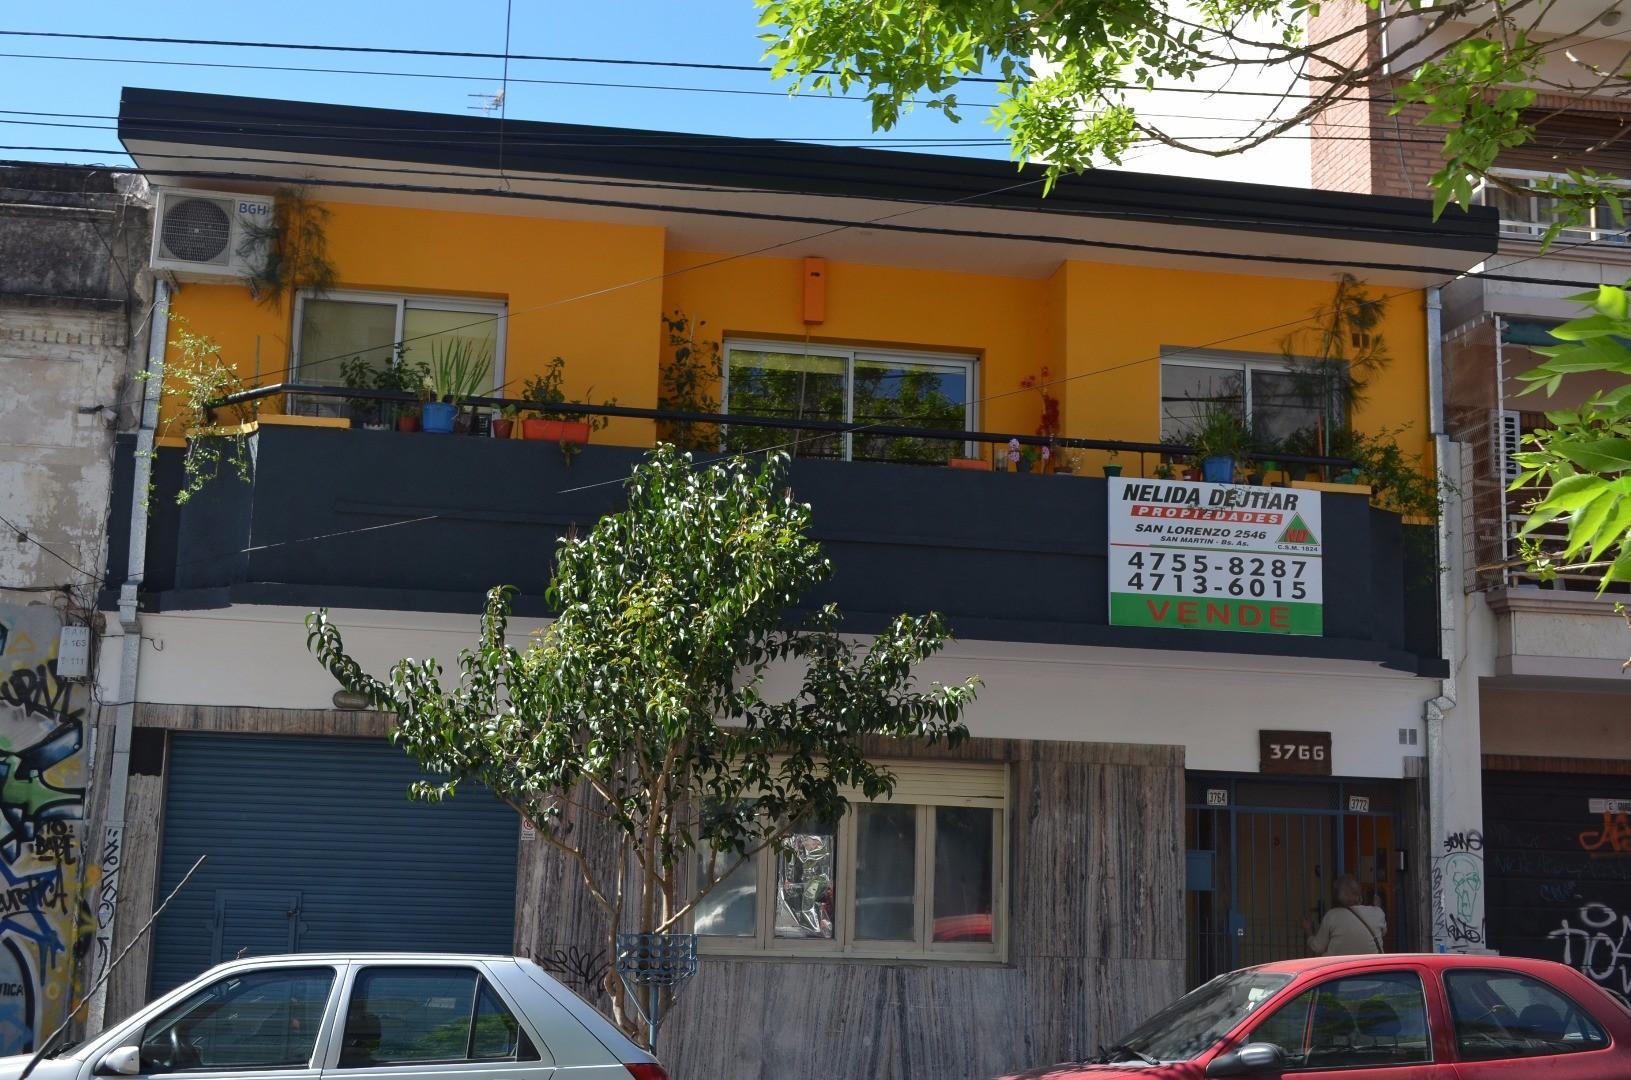 PISO 4 AMB. CON, PATIO, COCINA, LIVING COMEDOR SAN MARTÍN CENTRO